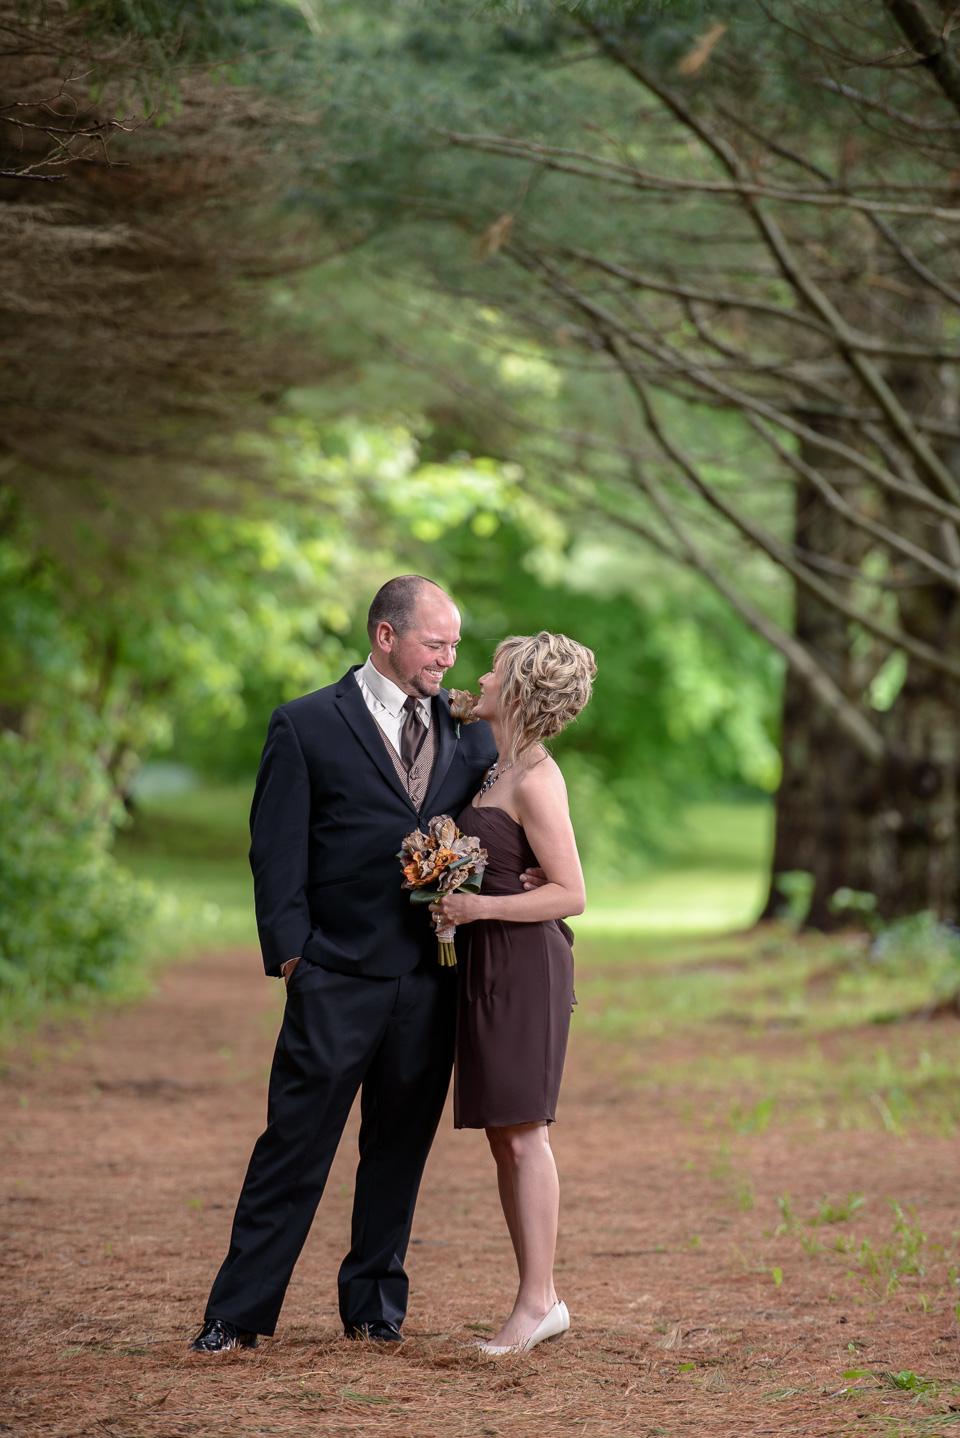 NIgel Fearon Photography | The LeBlanc Wedding-61.jpg